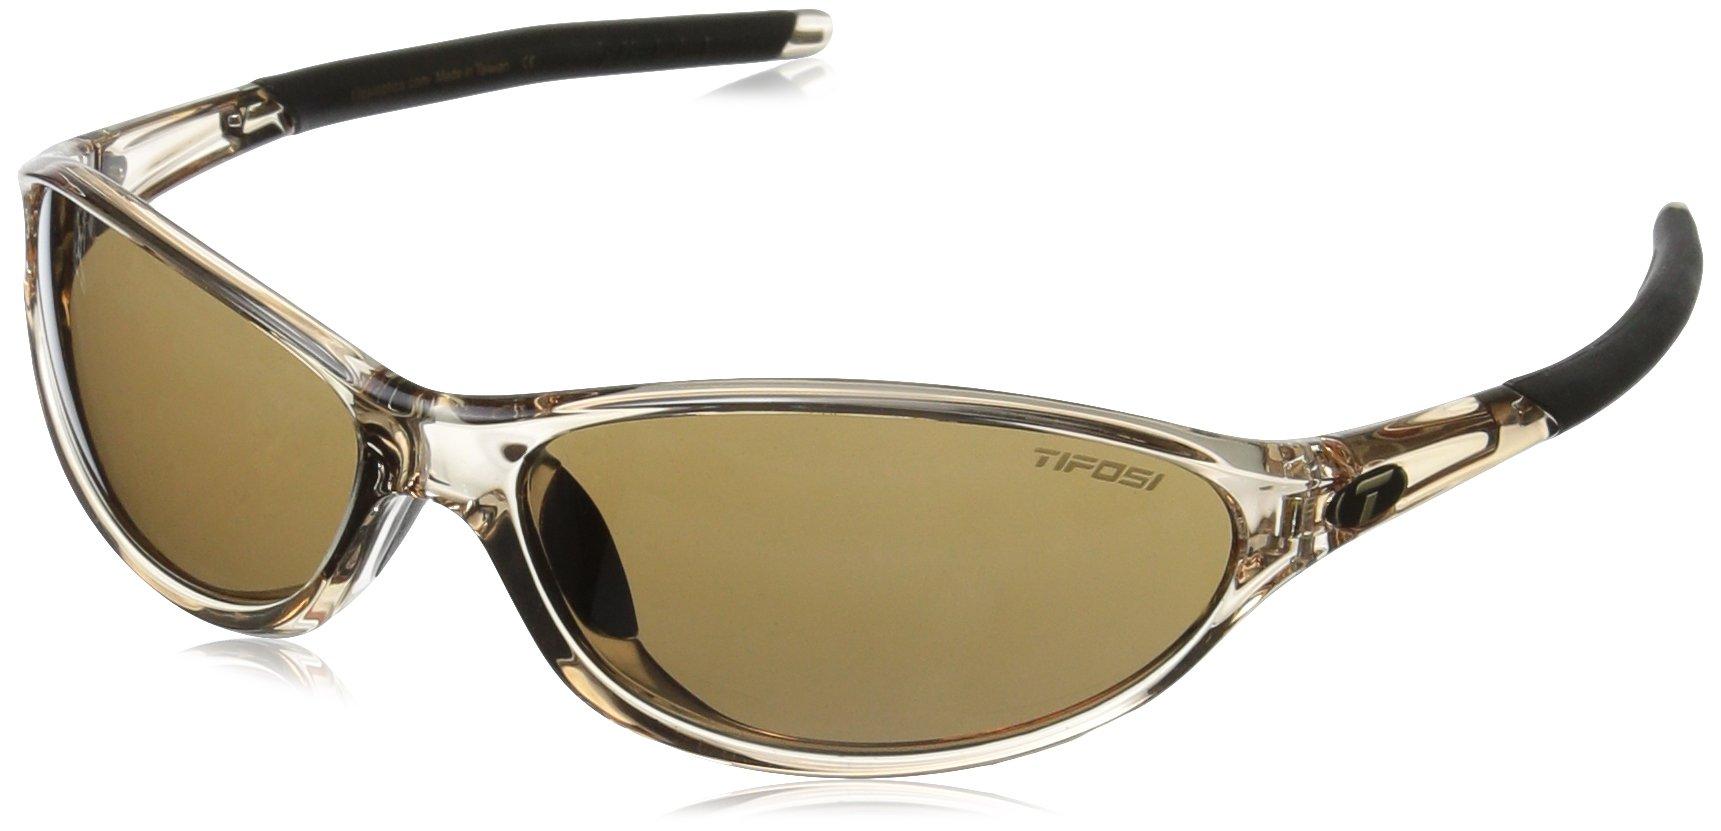 Tifosi Women's Alpe 2.0 Wrap Sunglasses Crystal Brown 128 mm